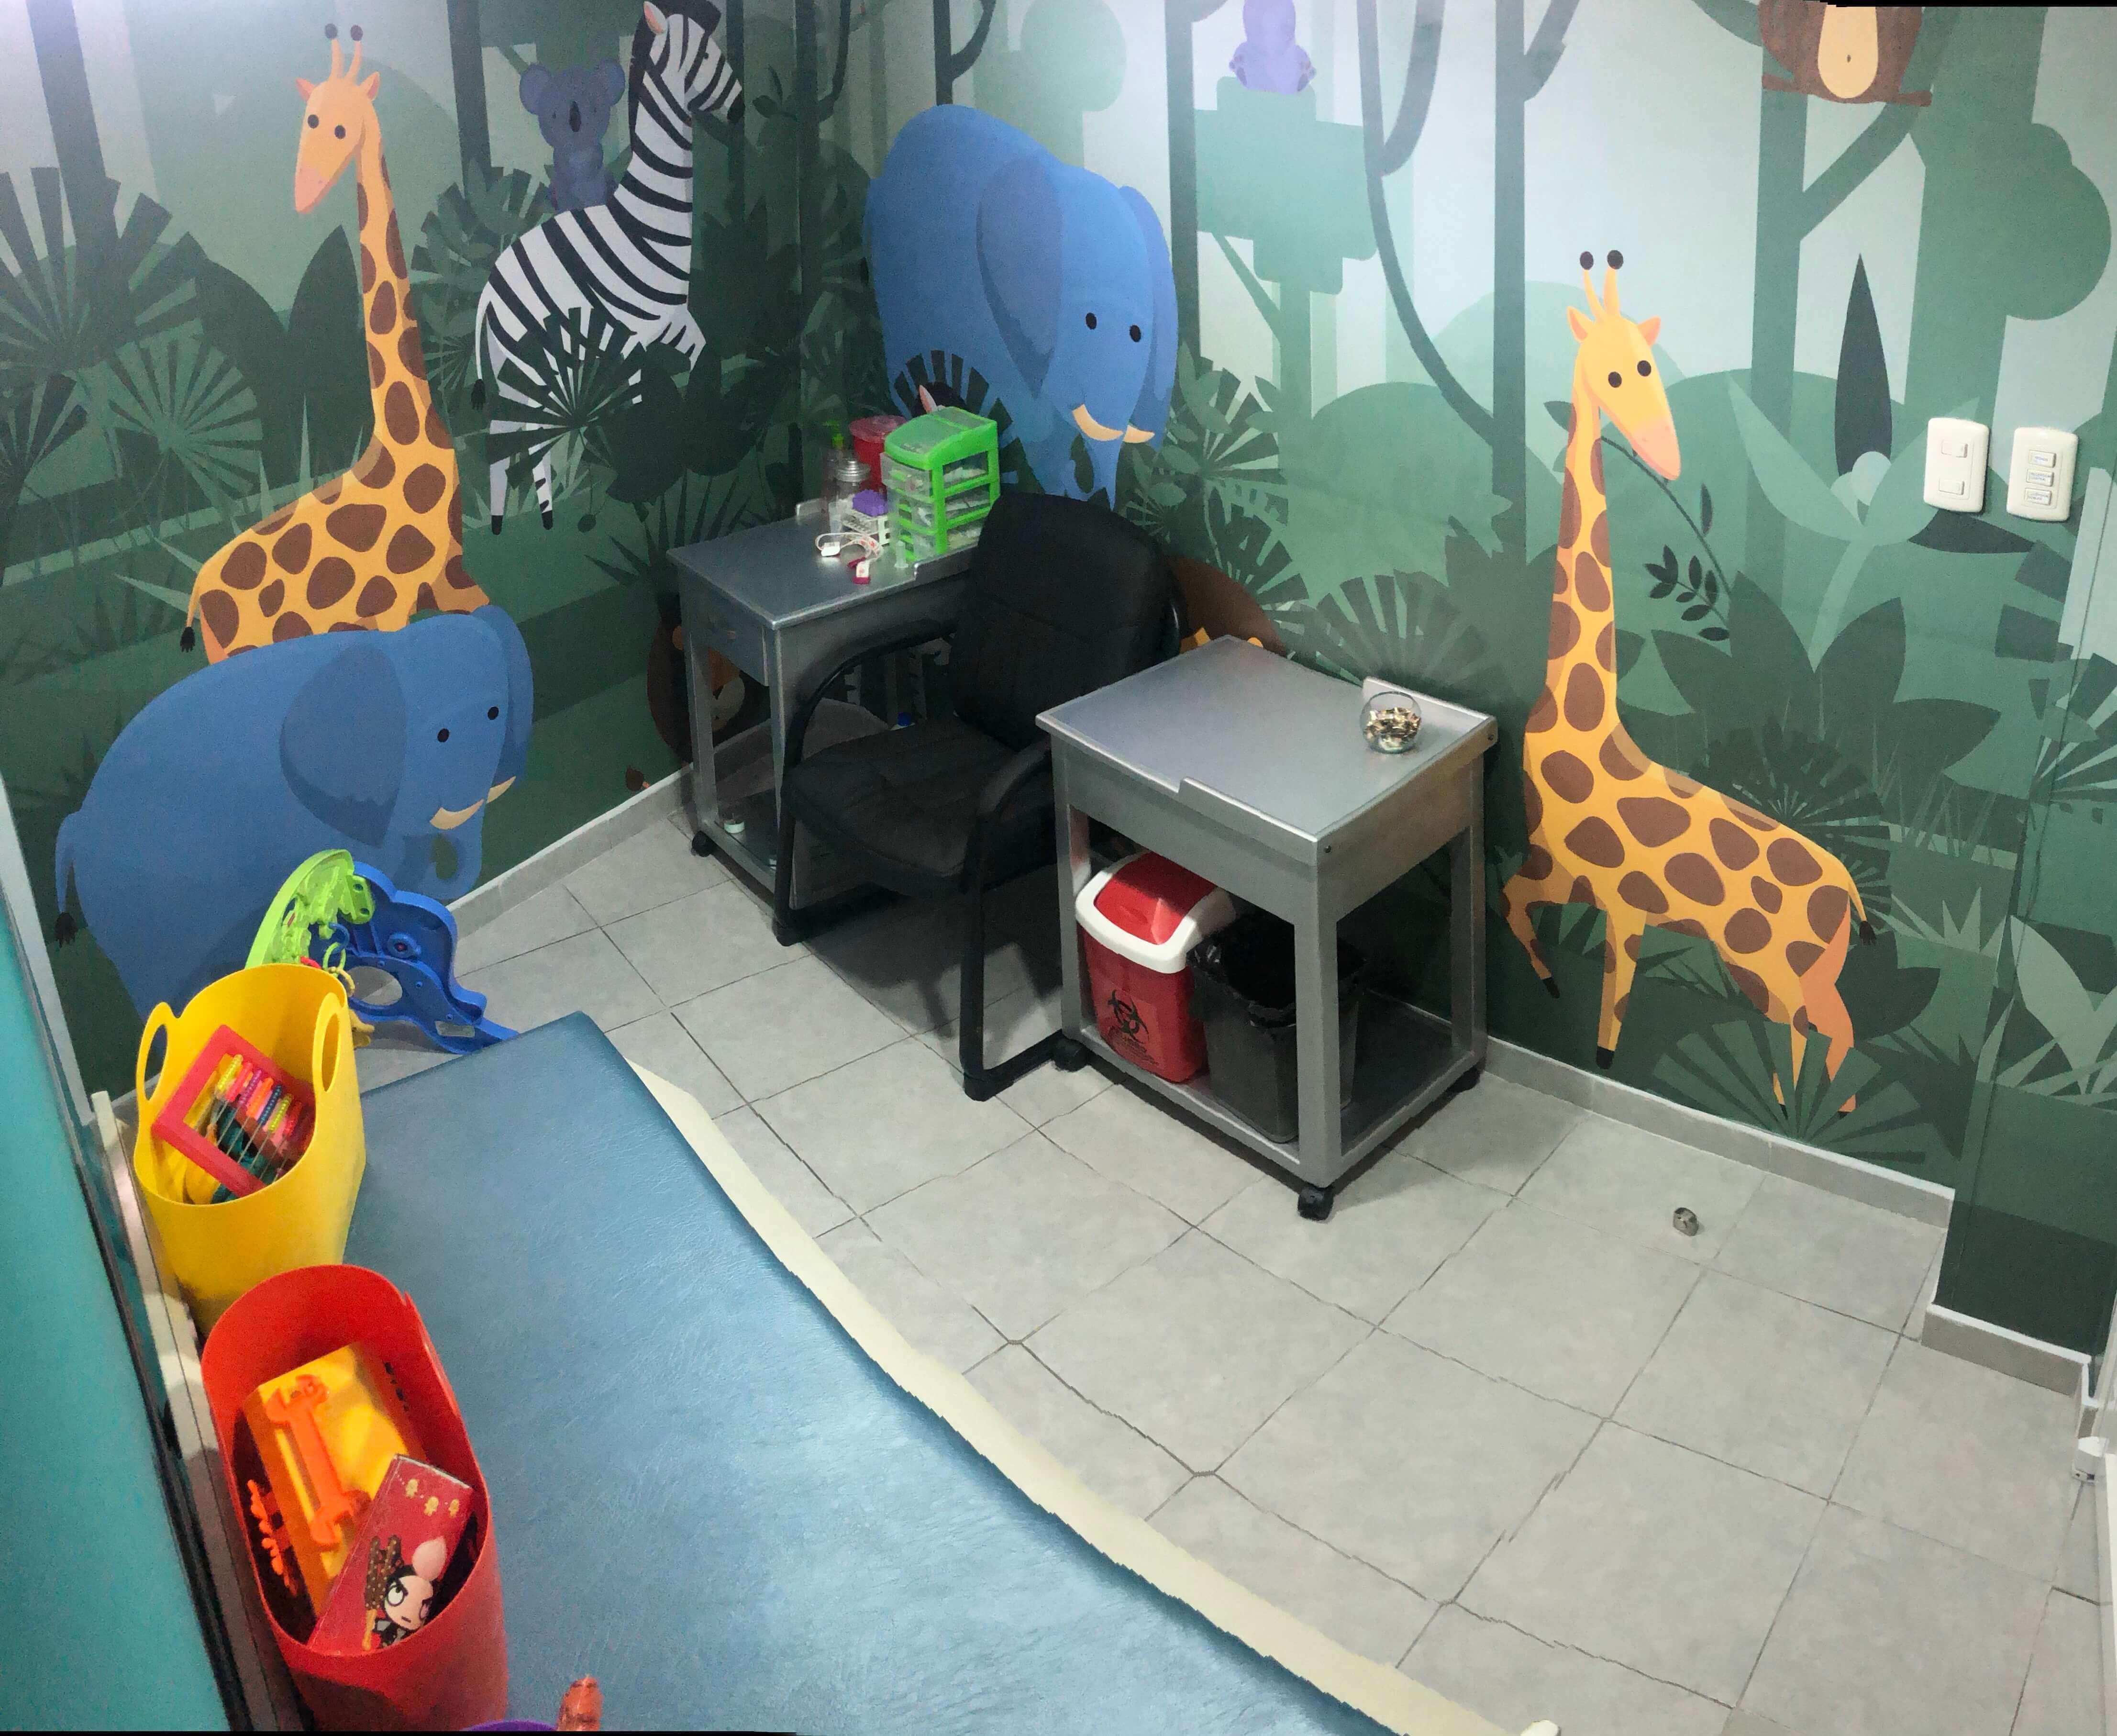 Laboratorio-biottek-area-pediatrica-alameda-cordoba-2.JPG